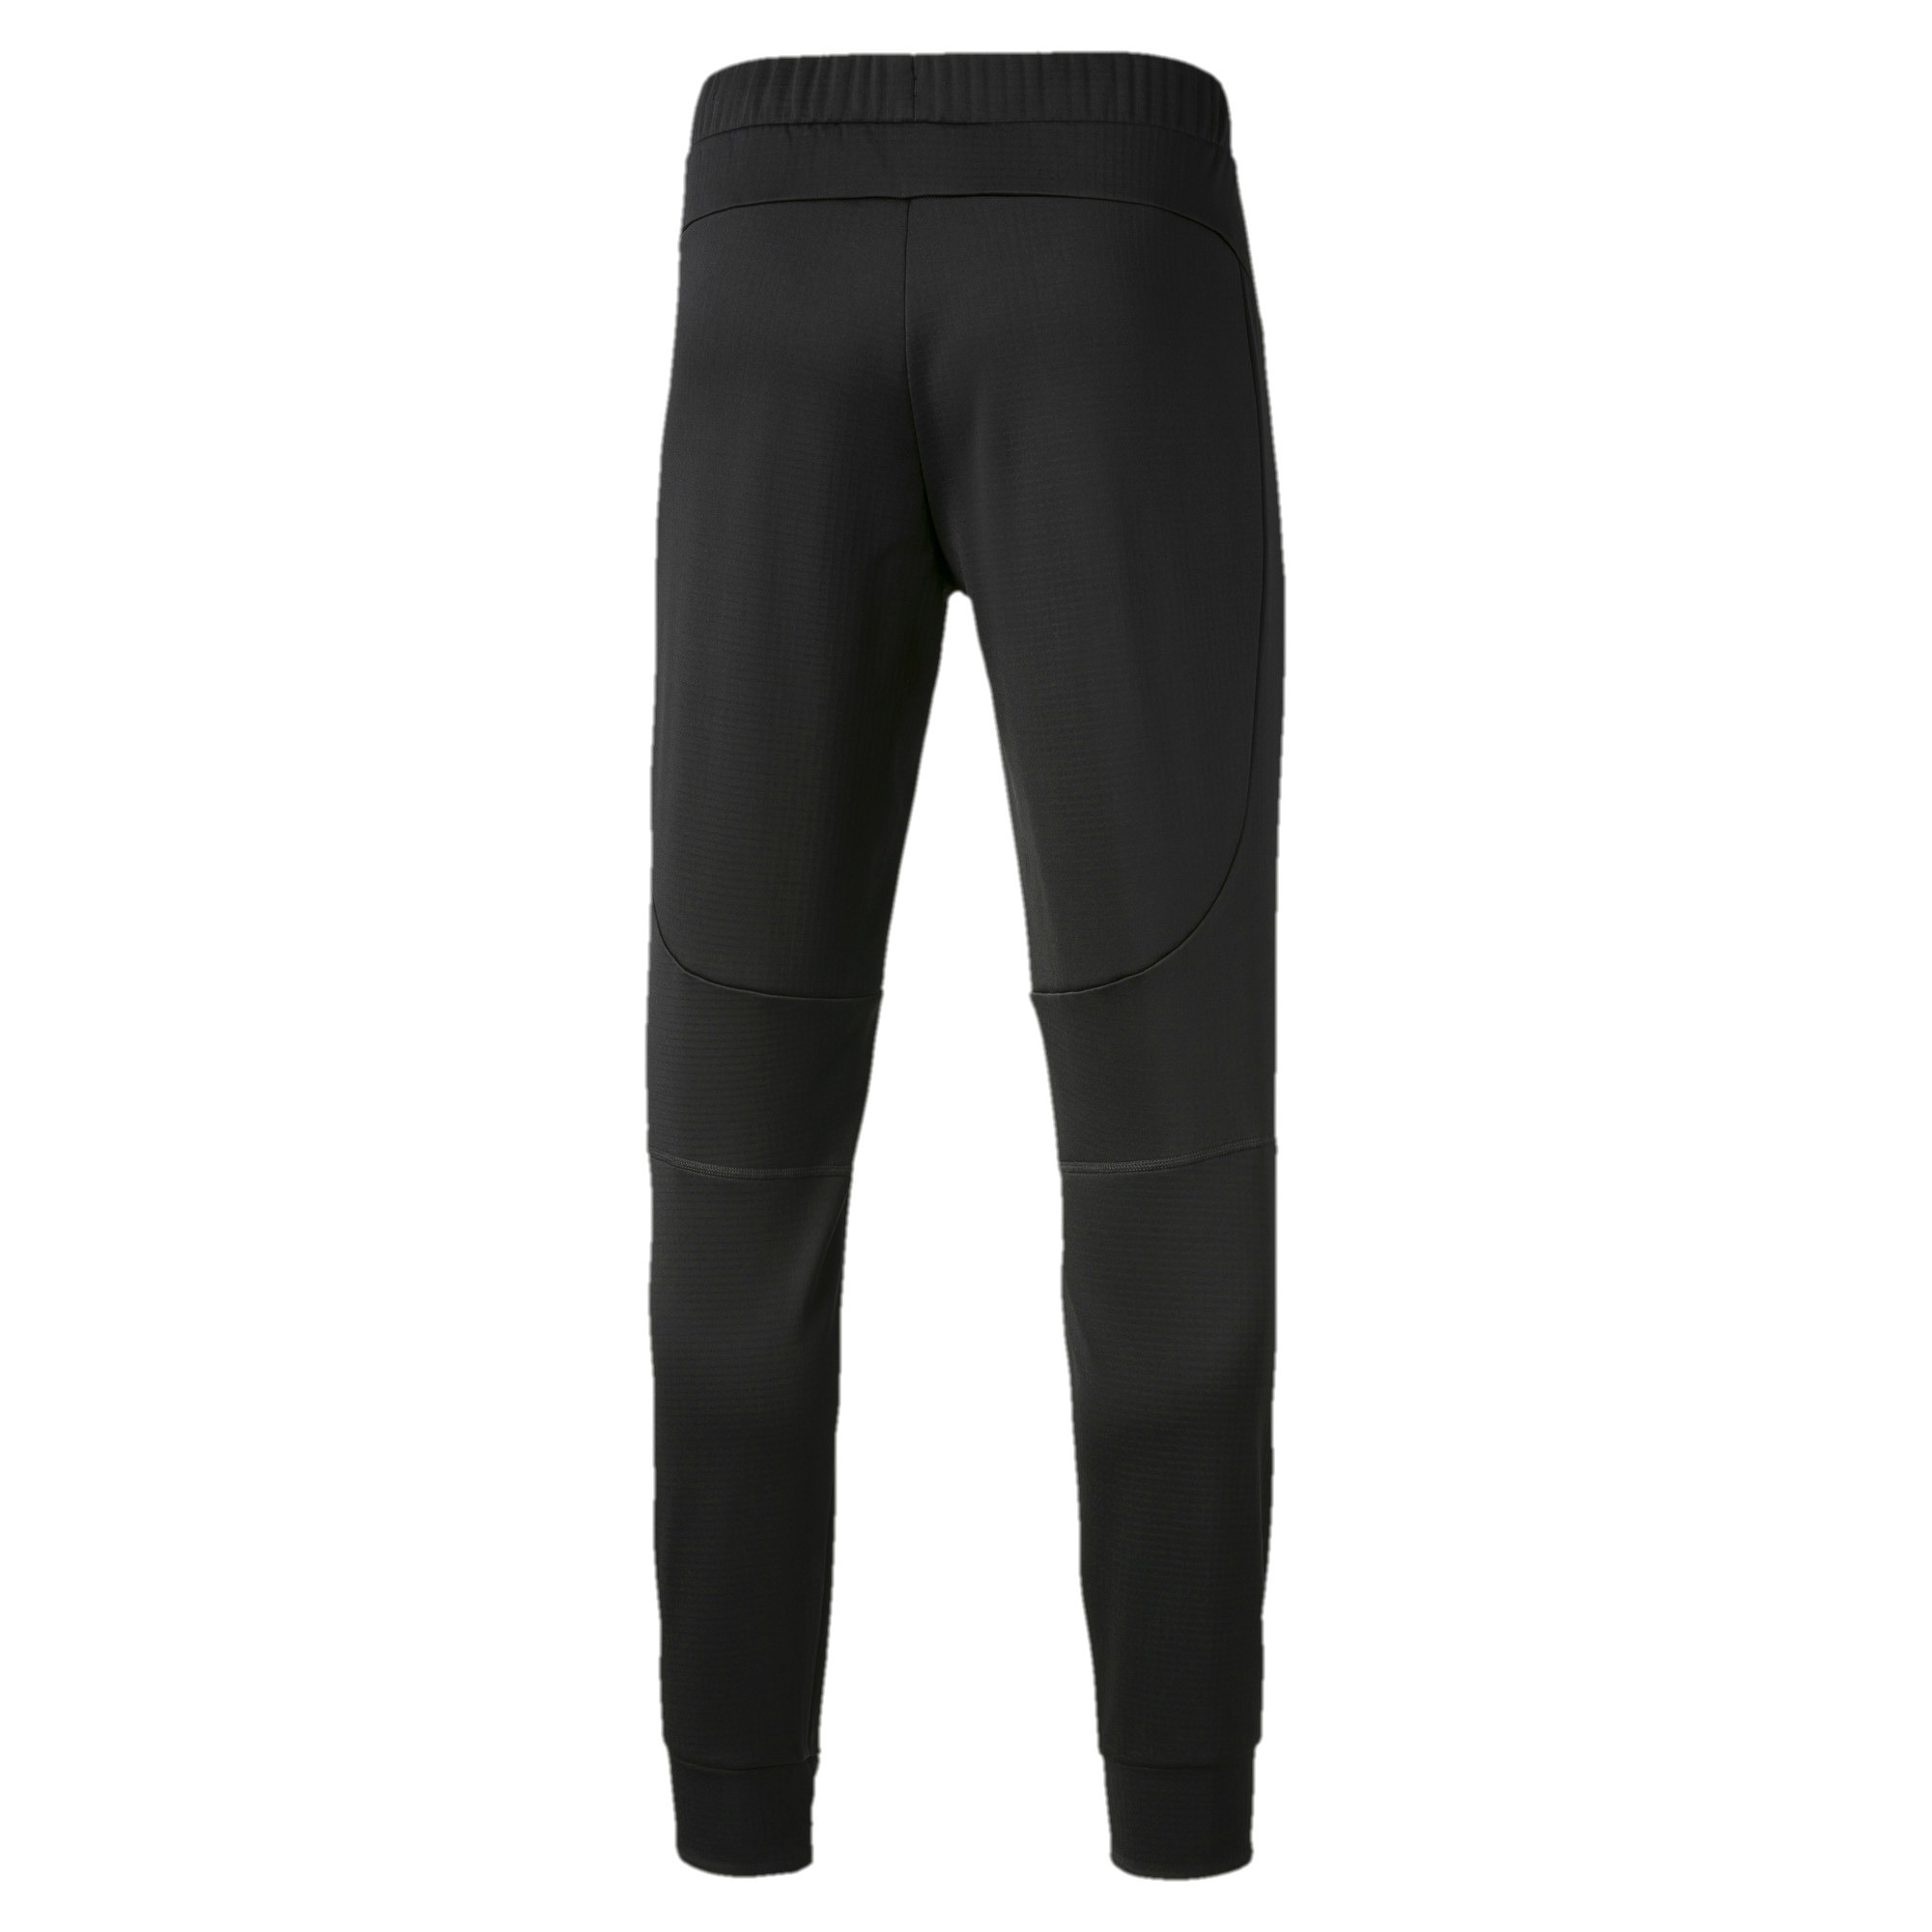 PUMA-Evostripe-Warm-Men-039-s-Pants-Men-Knitted-Pants-Basics miniatura 8